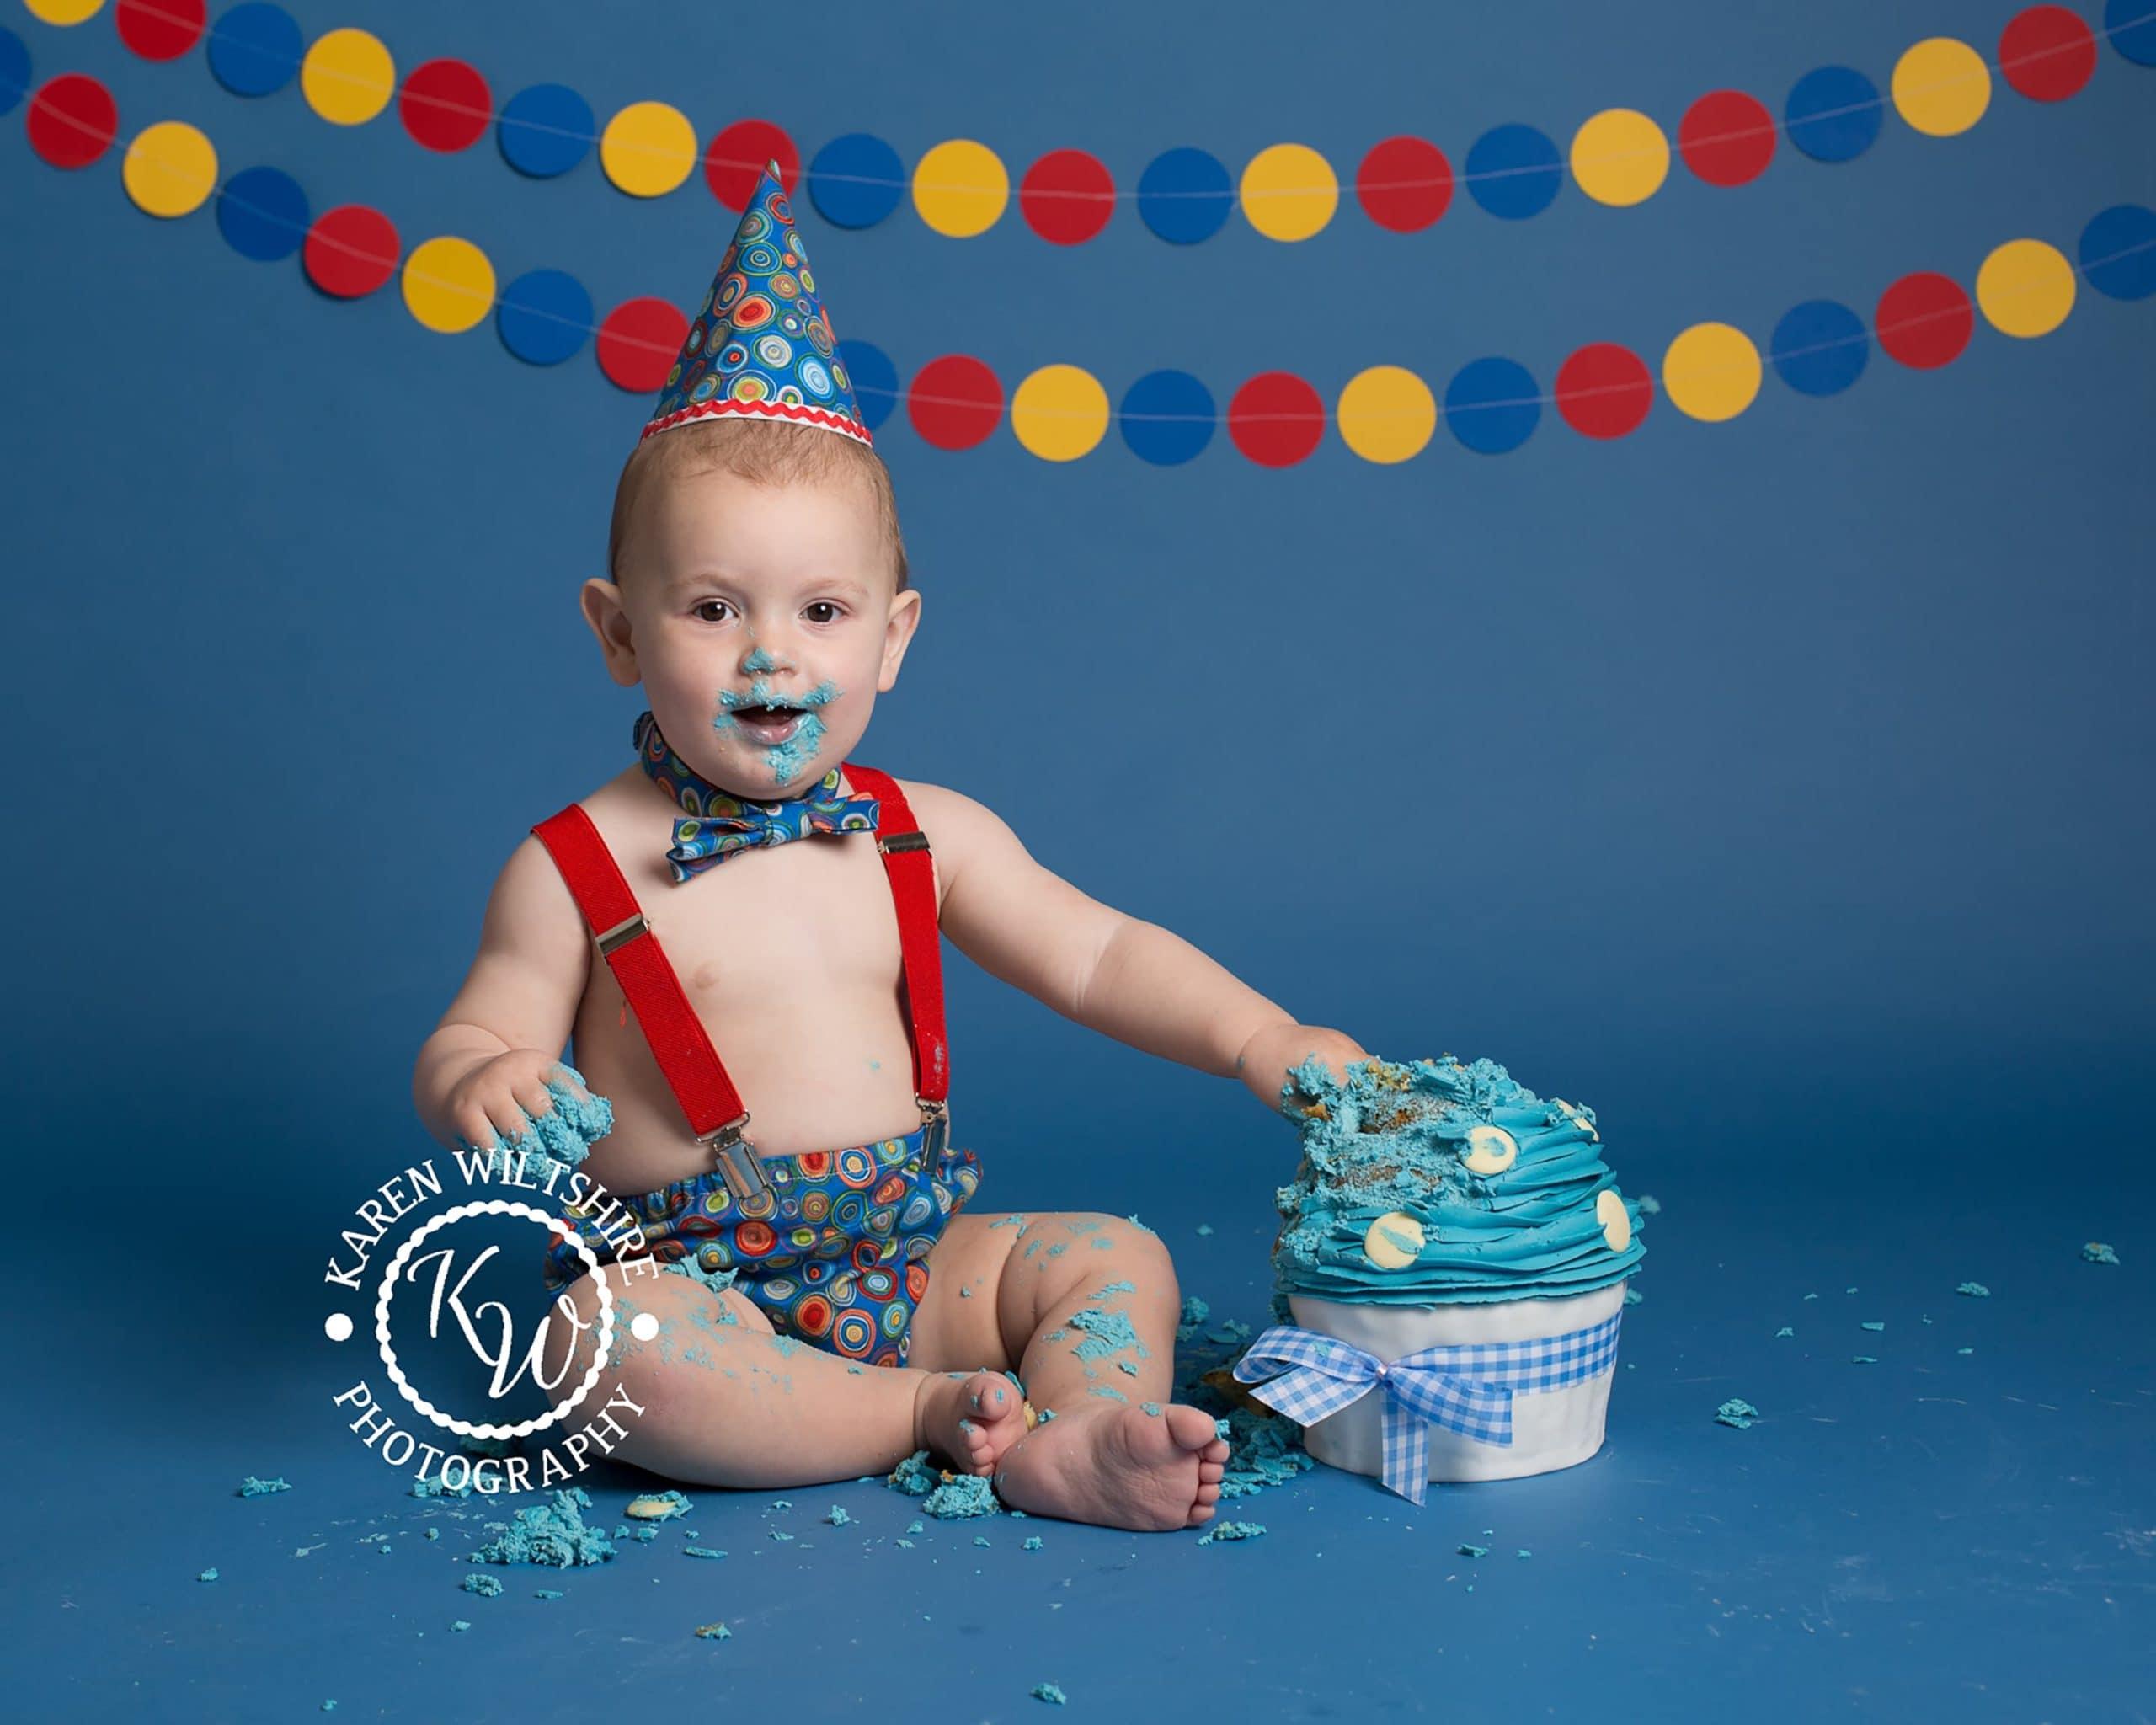 Boys smash the cake session on a blue background